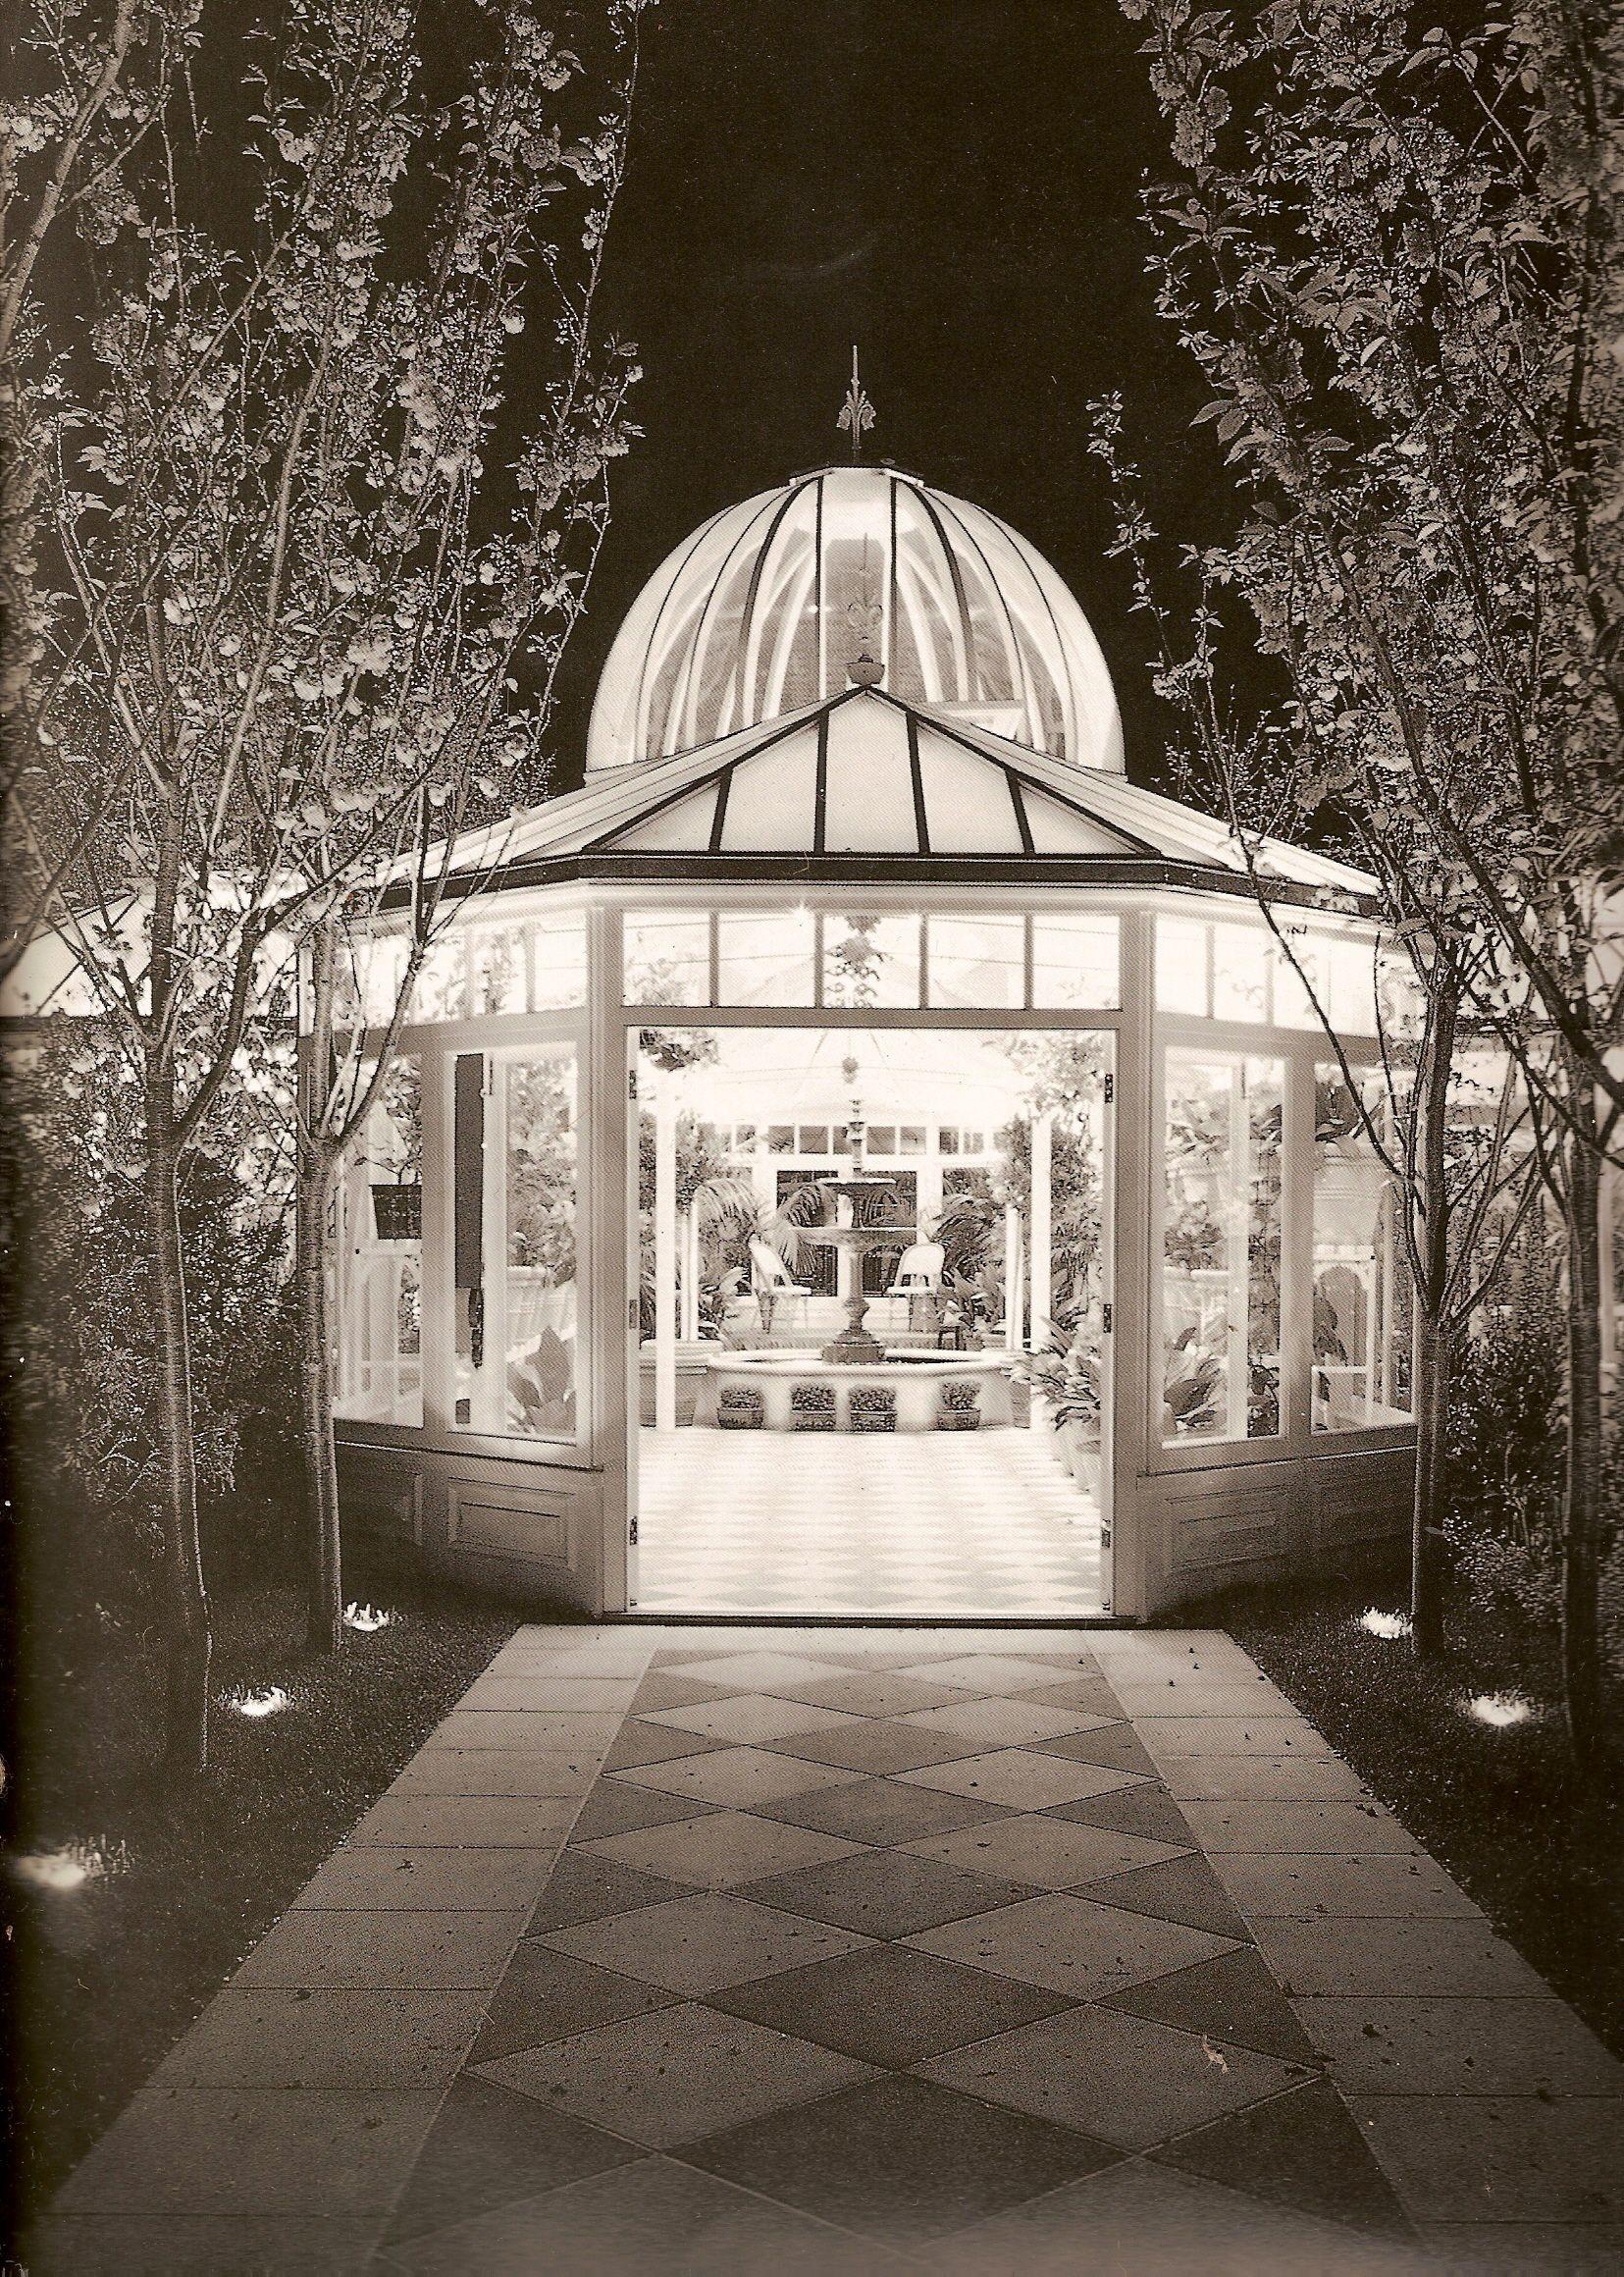 Botanica, Melbourne Australia - Paul Bangay